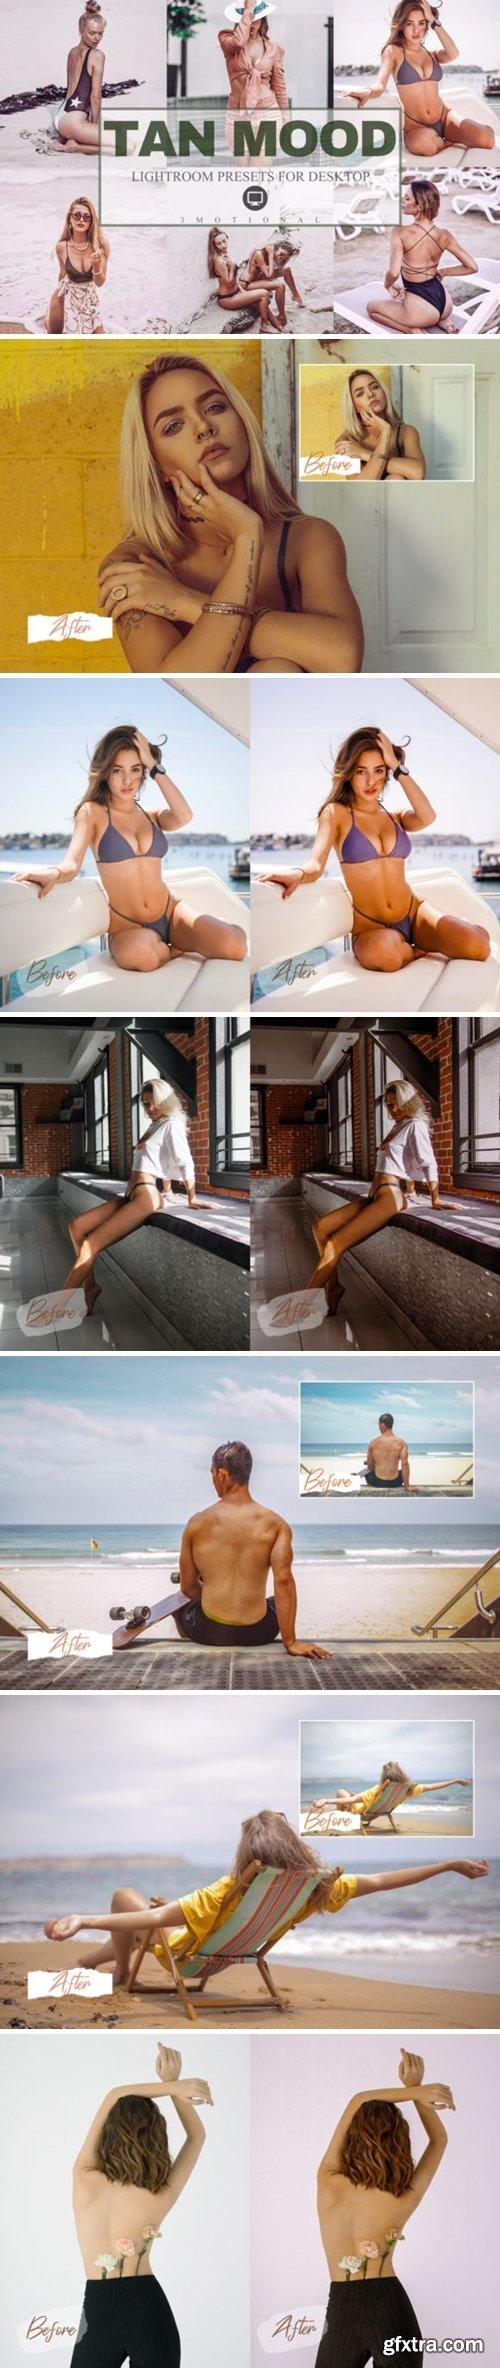 9 Tan Mood Lightroom Presets 4264670